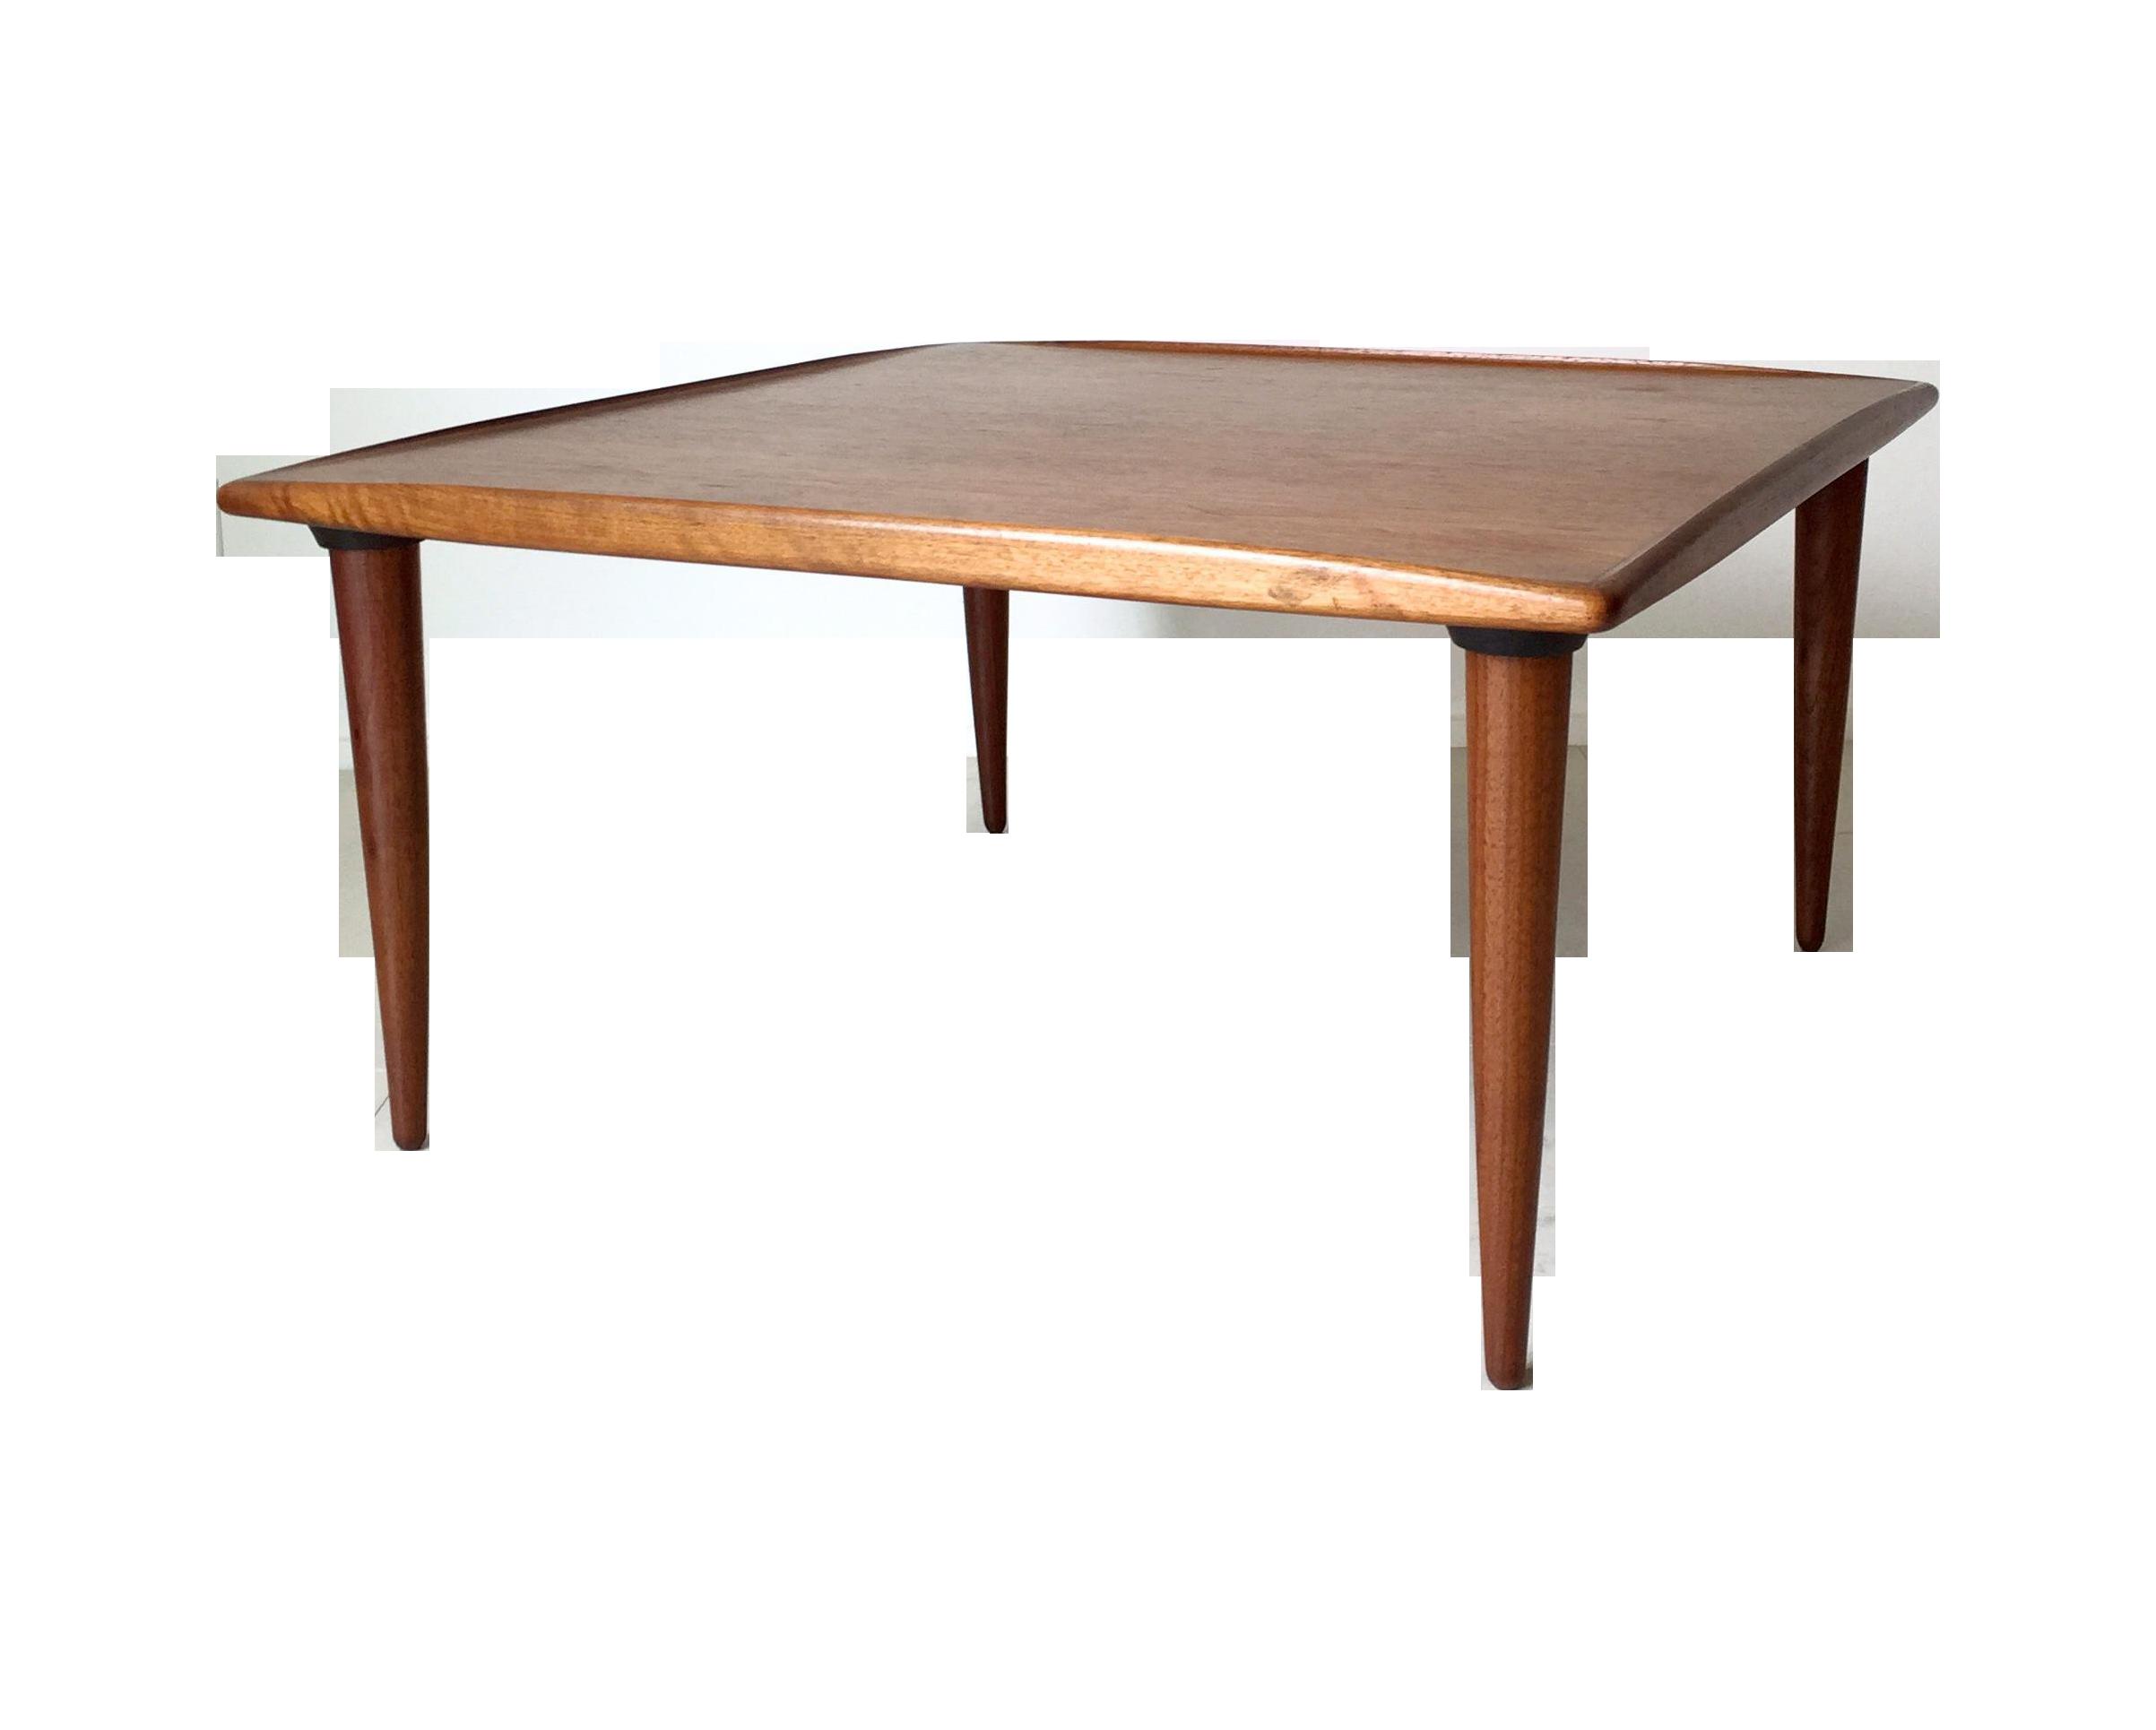 Danish Teak Juhl Jalk Style Moreddi Coffee Table Chairish : danish teak juhl jalk style moreddi coffee table 4182aspectfitampwidth640ampheight640 from www.chairish.com size 640 x 640 jpeg 19kB